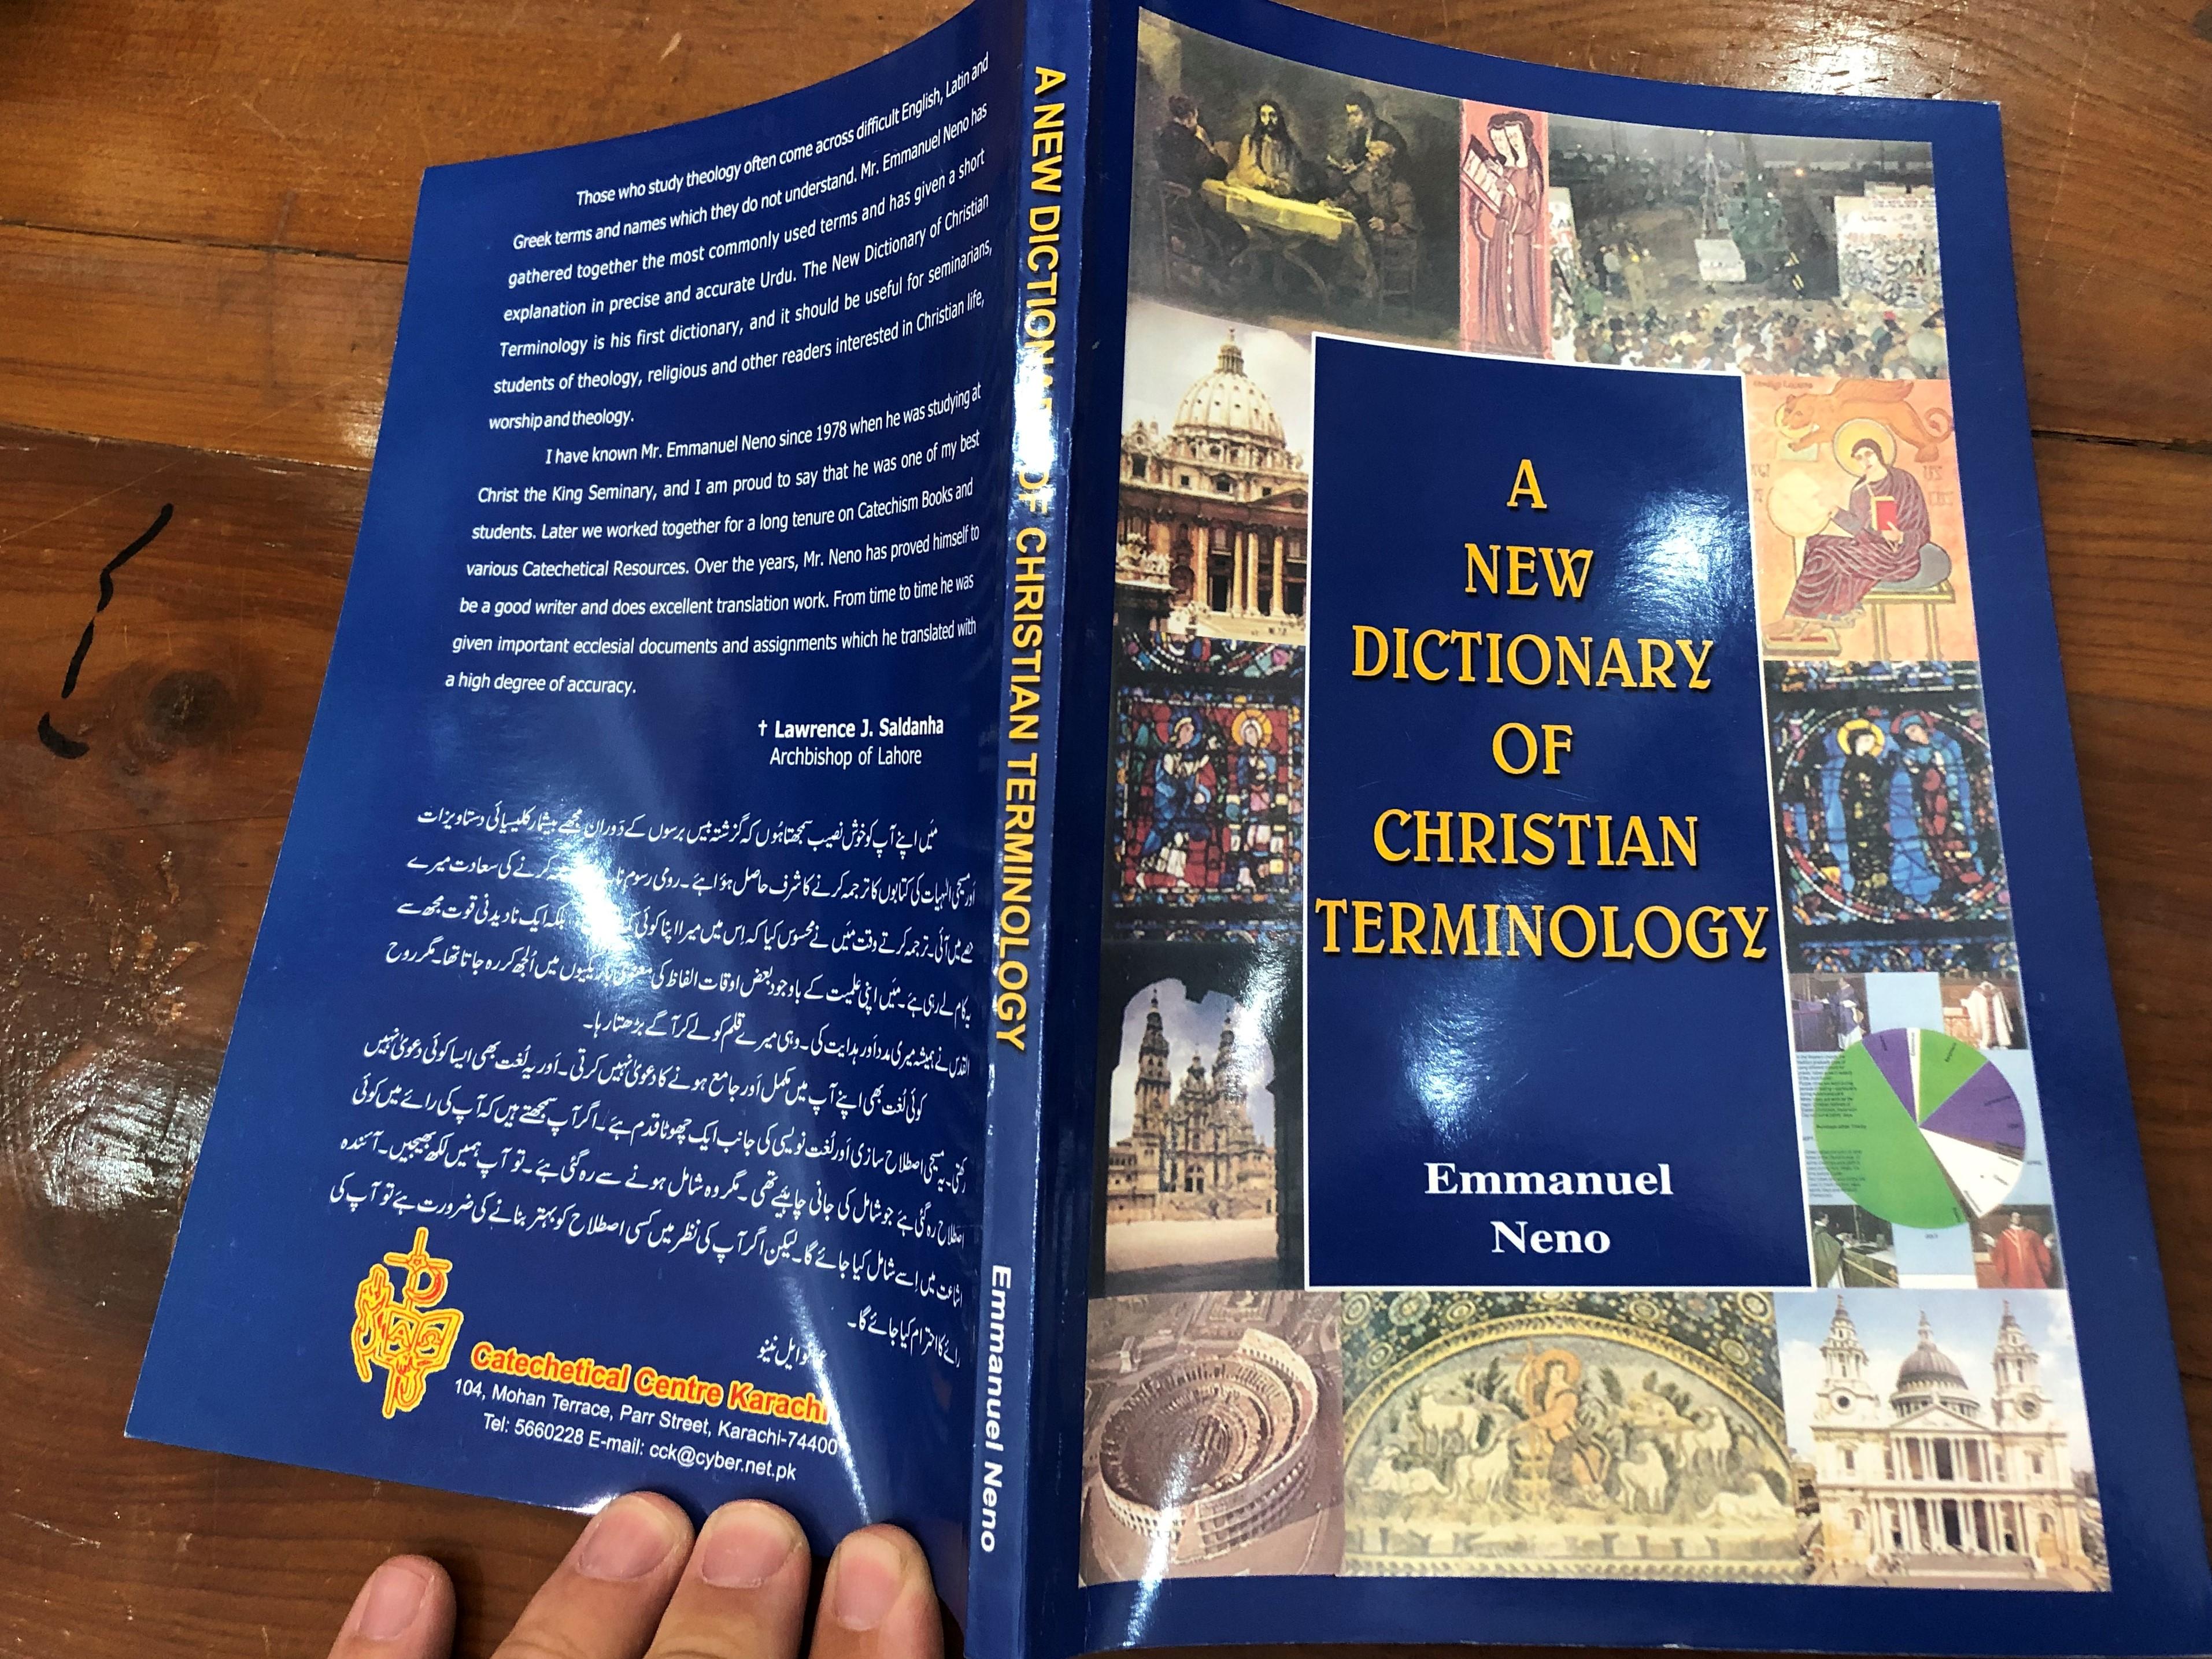 a-new-dictionary-of-christian-terminology-by-emmanuel-neno-catechetical-centre-karachi-2009-13-.jpg